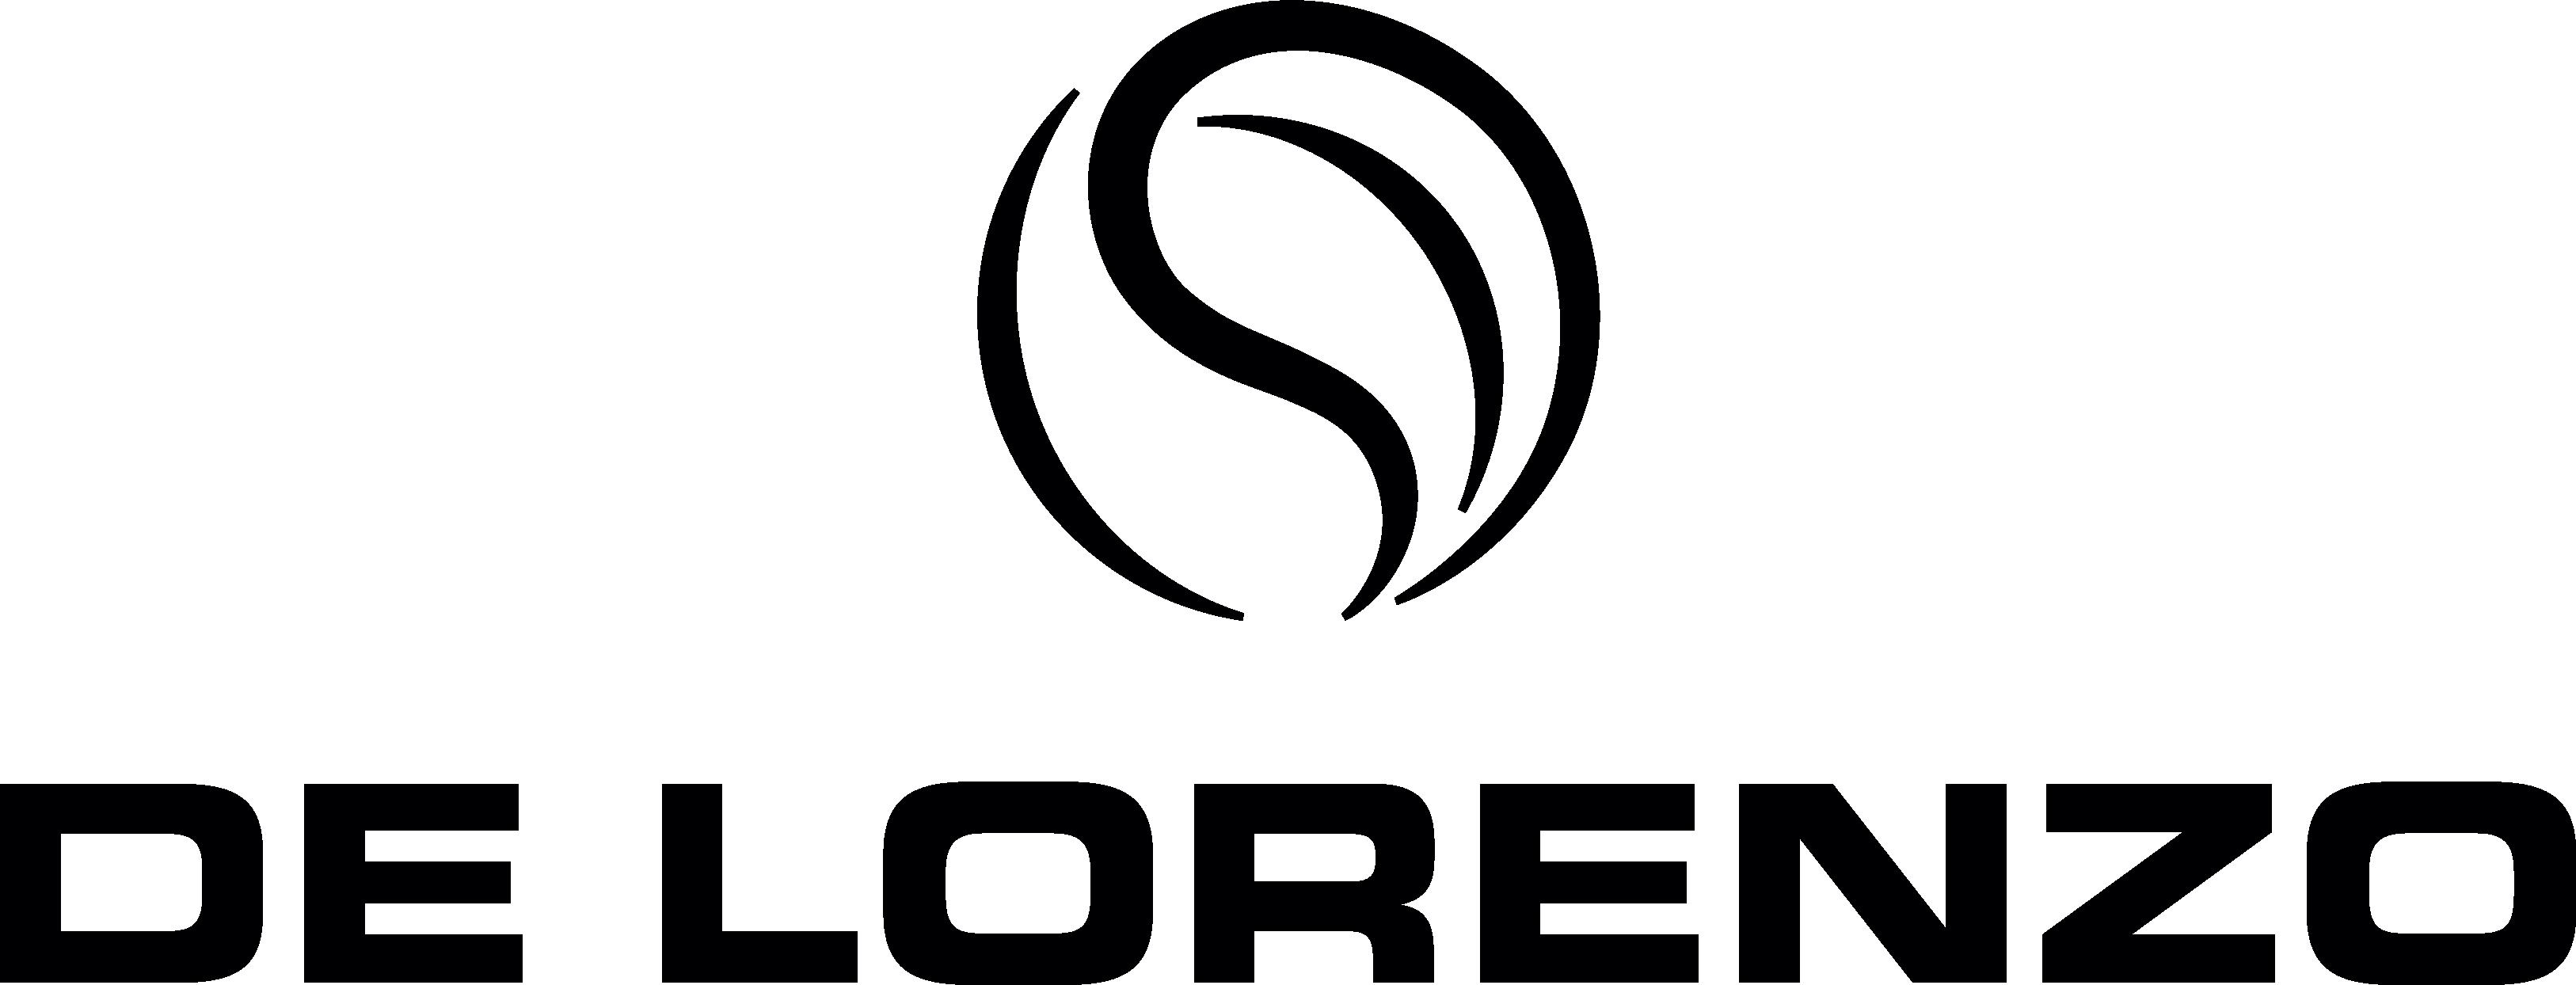 de-lorenzo-logo